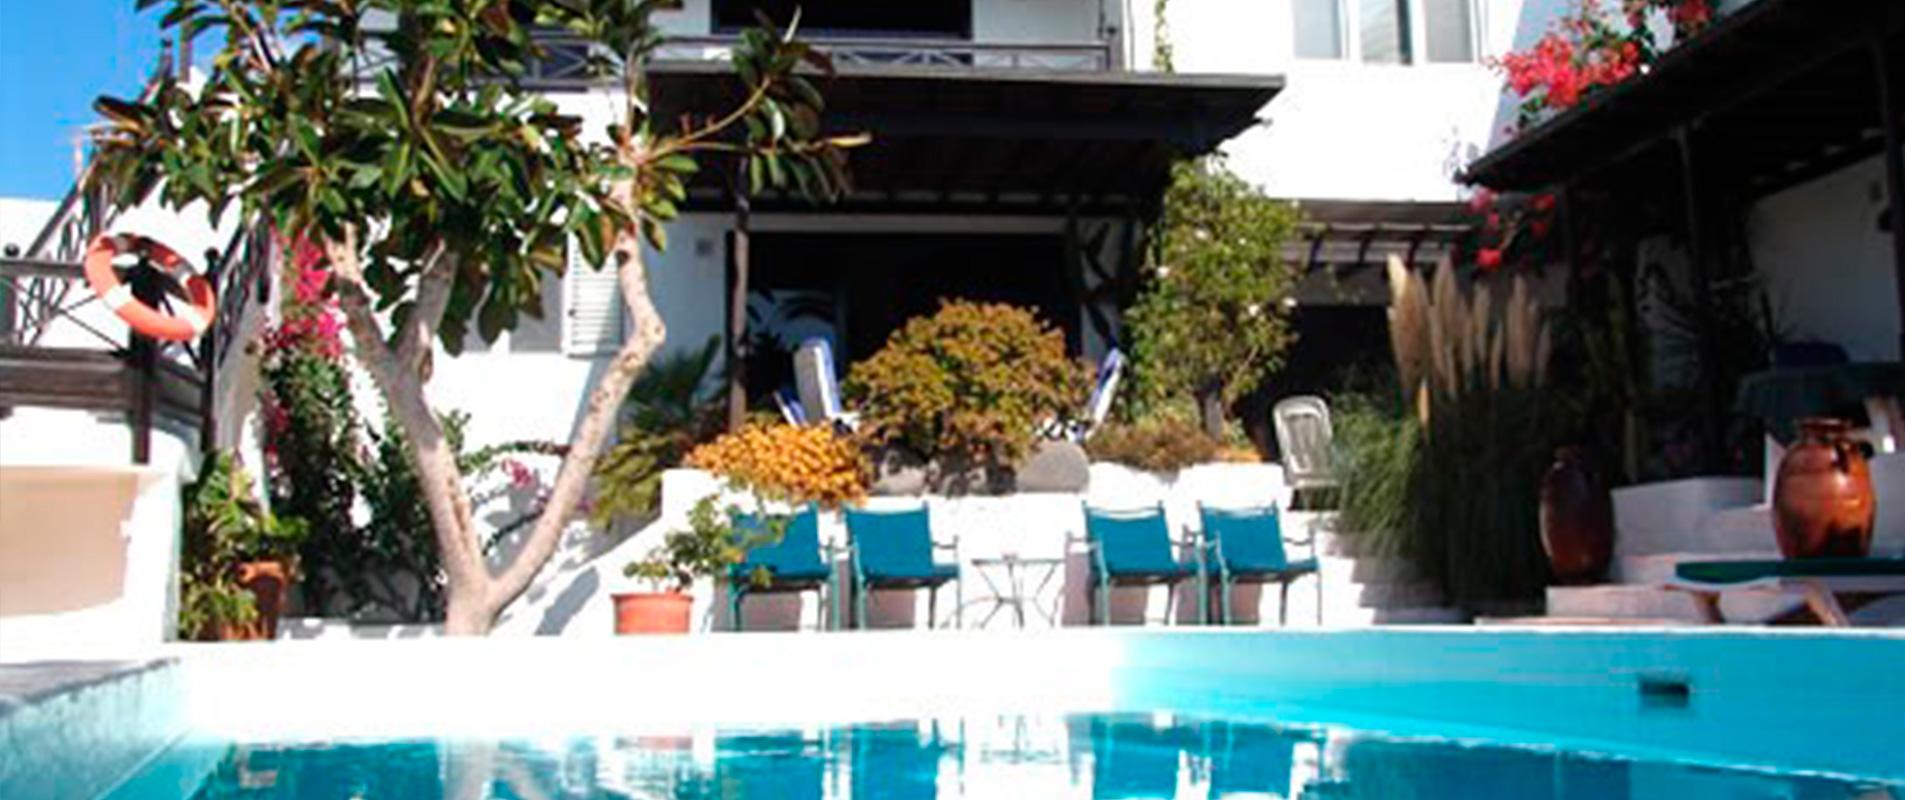 Luxury Villa Puerto del Carmen, ref. 0088